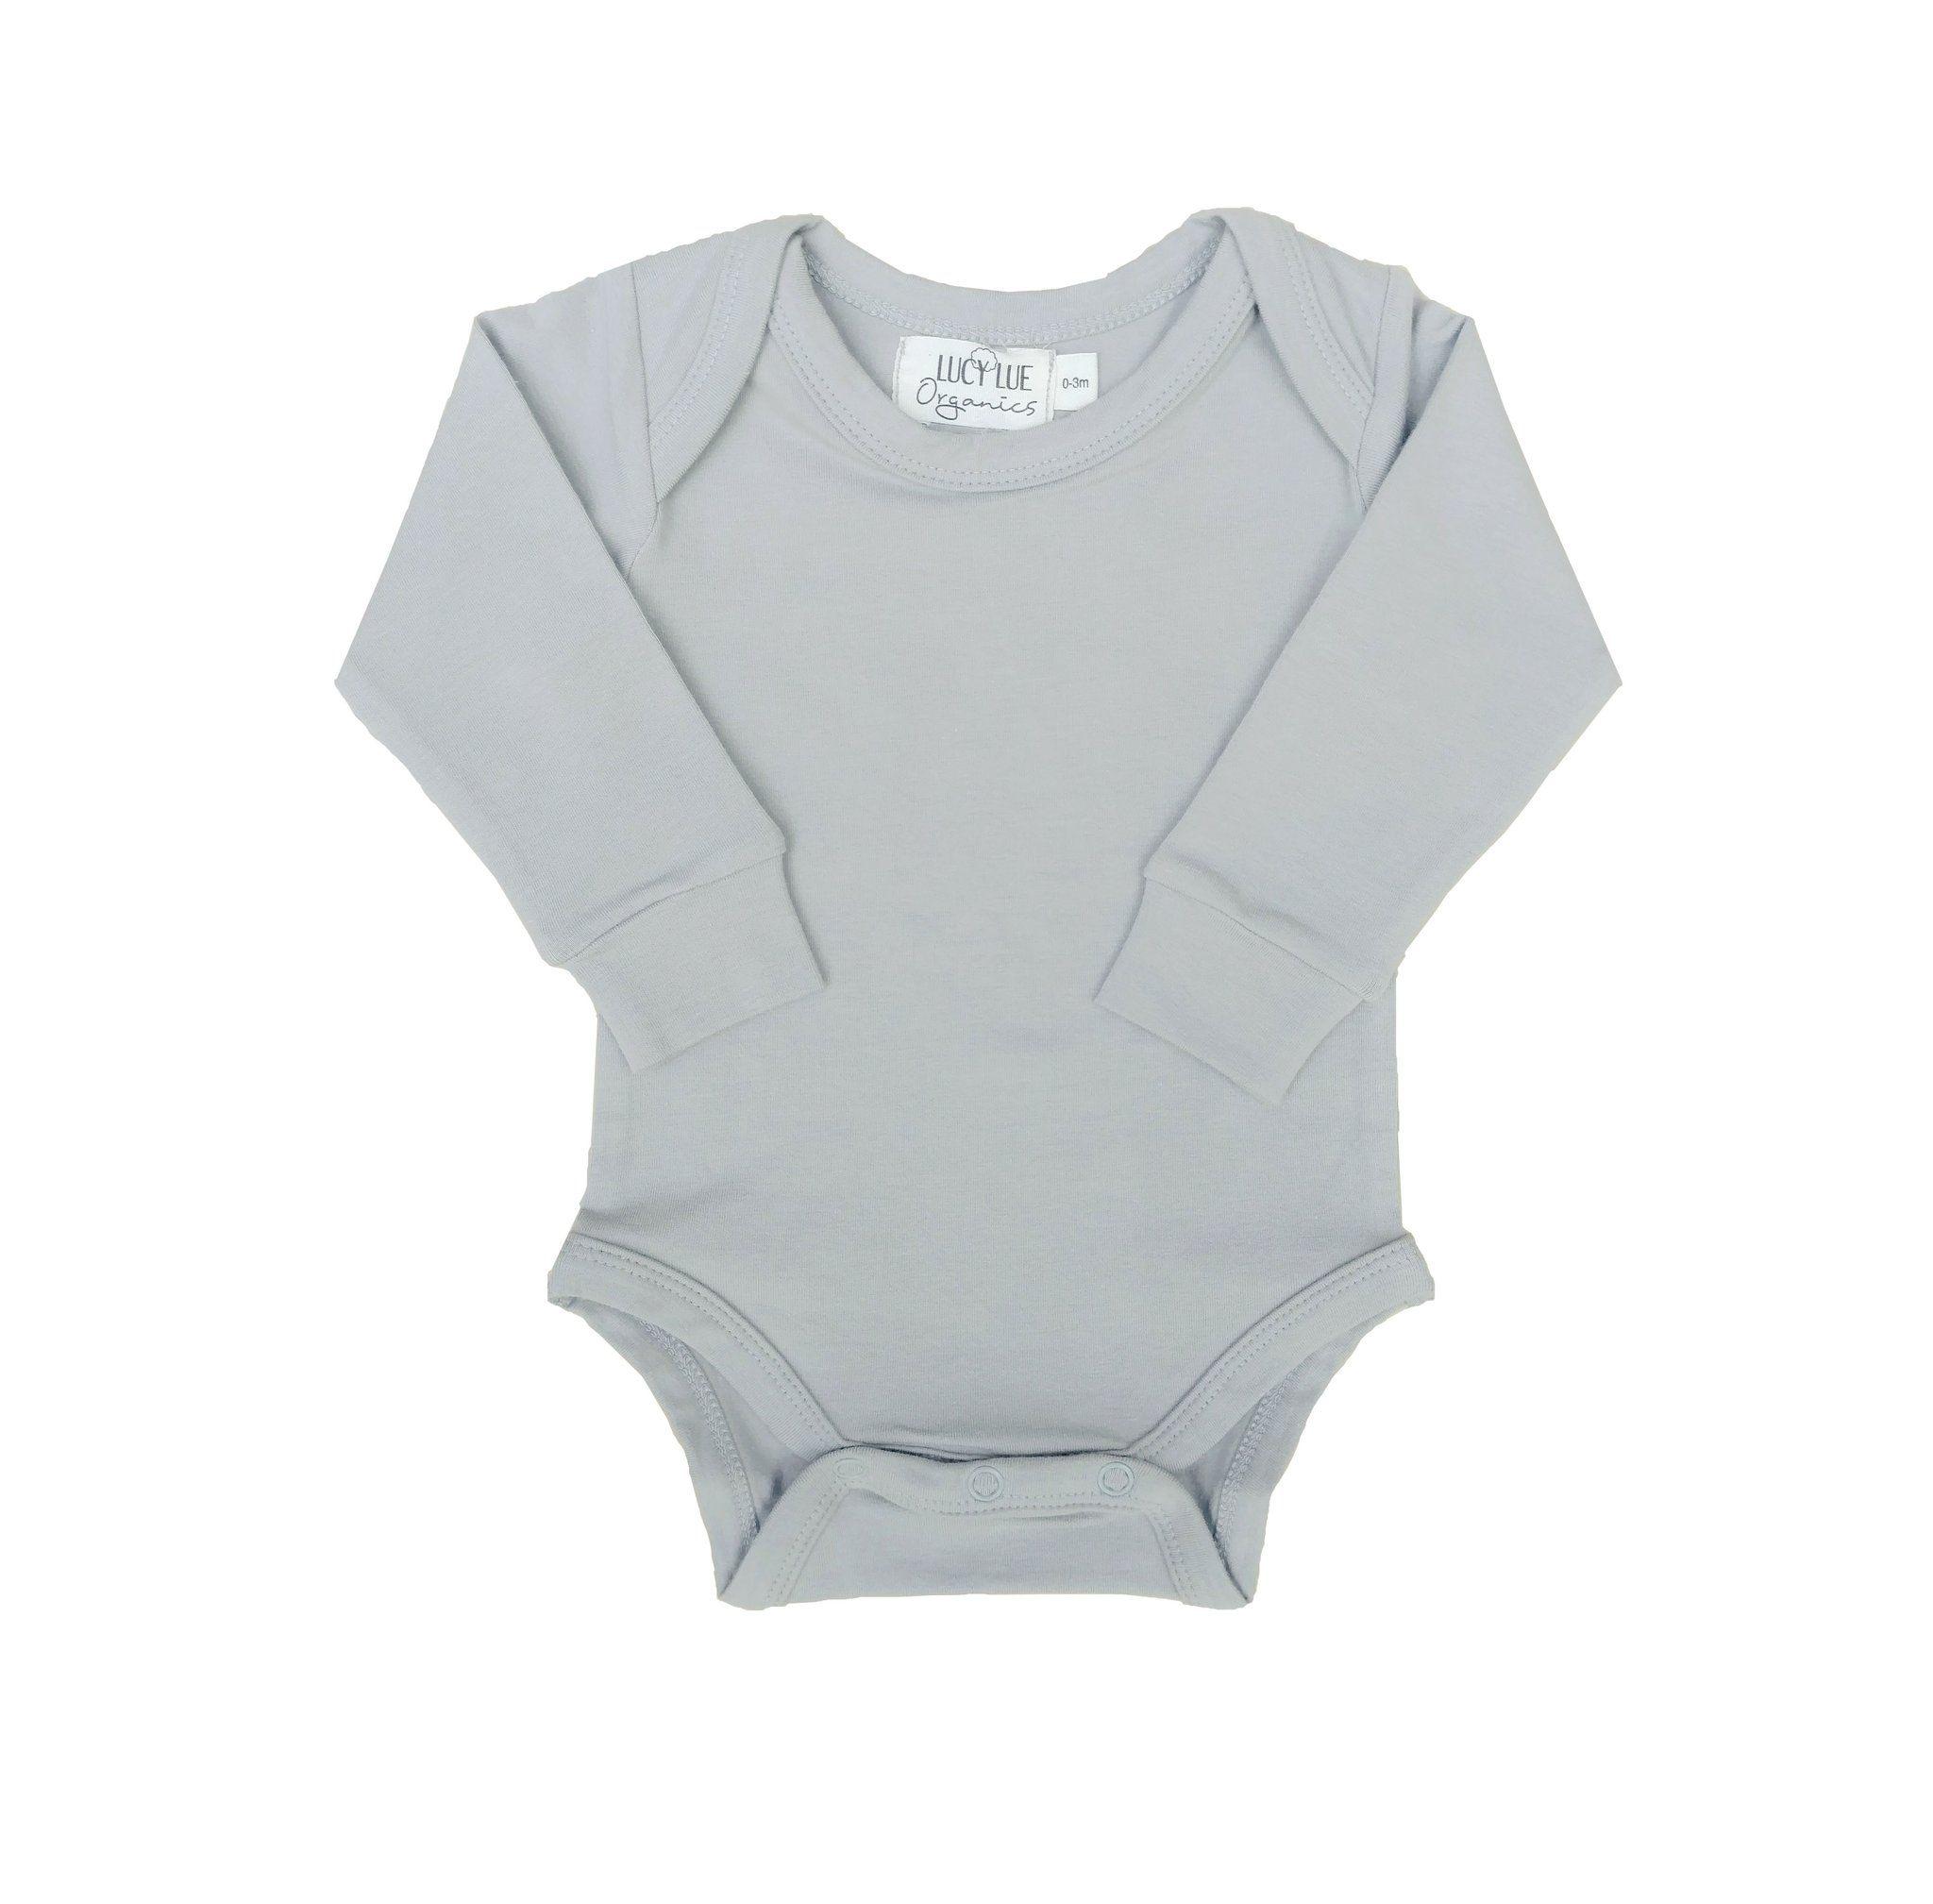 fa57189e9 Organic bodysuits